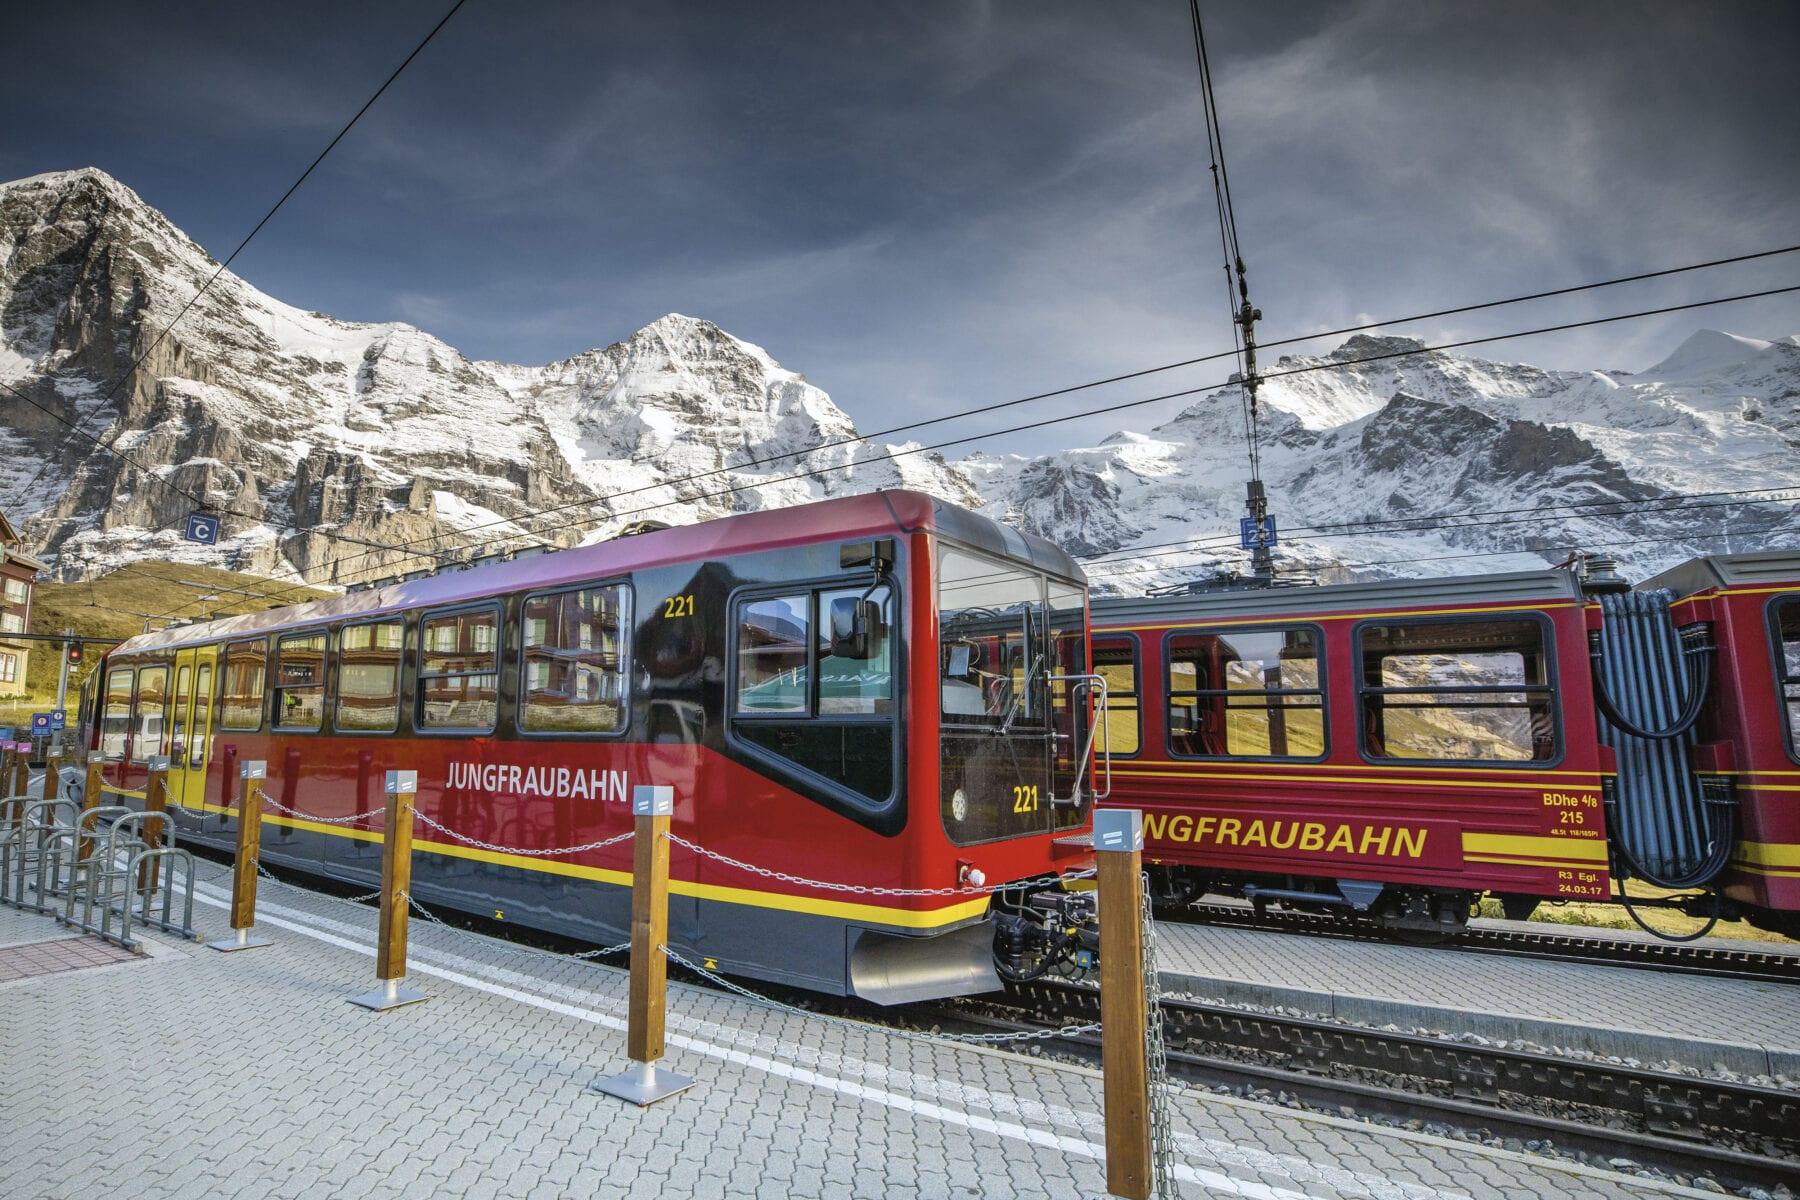 Eiger Express Jungfraujoch station